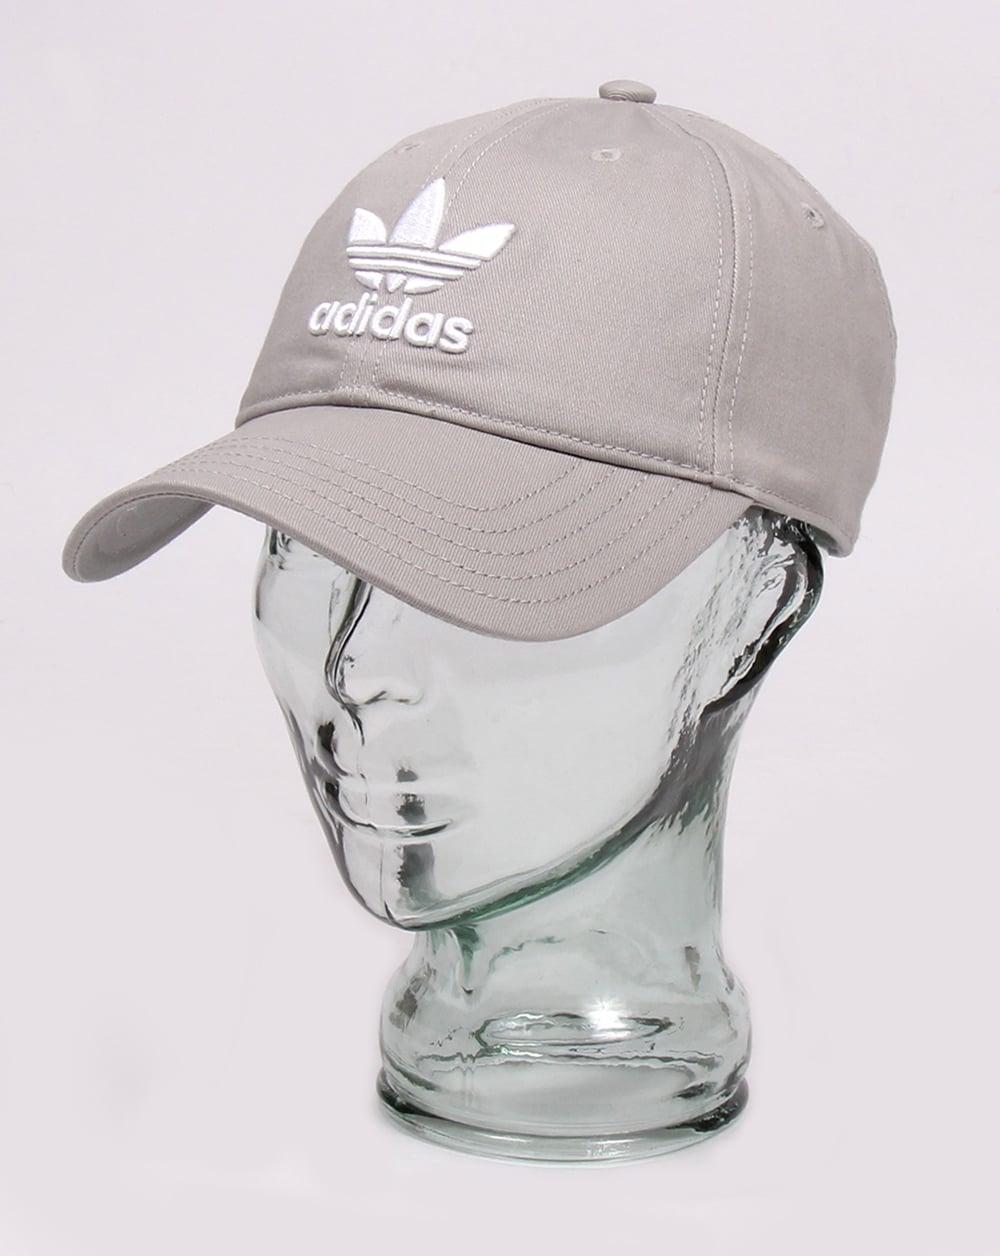 65055c3346b23 adidas Originals Adidas Originals Trefoil Baseball Cap Grey